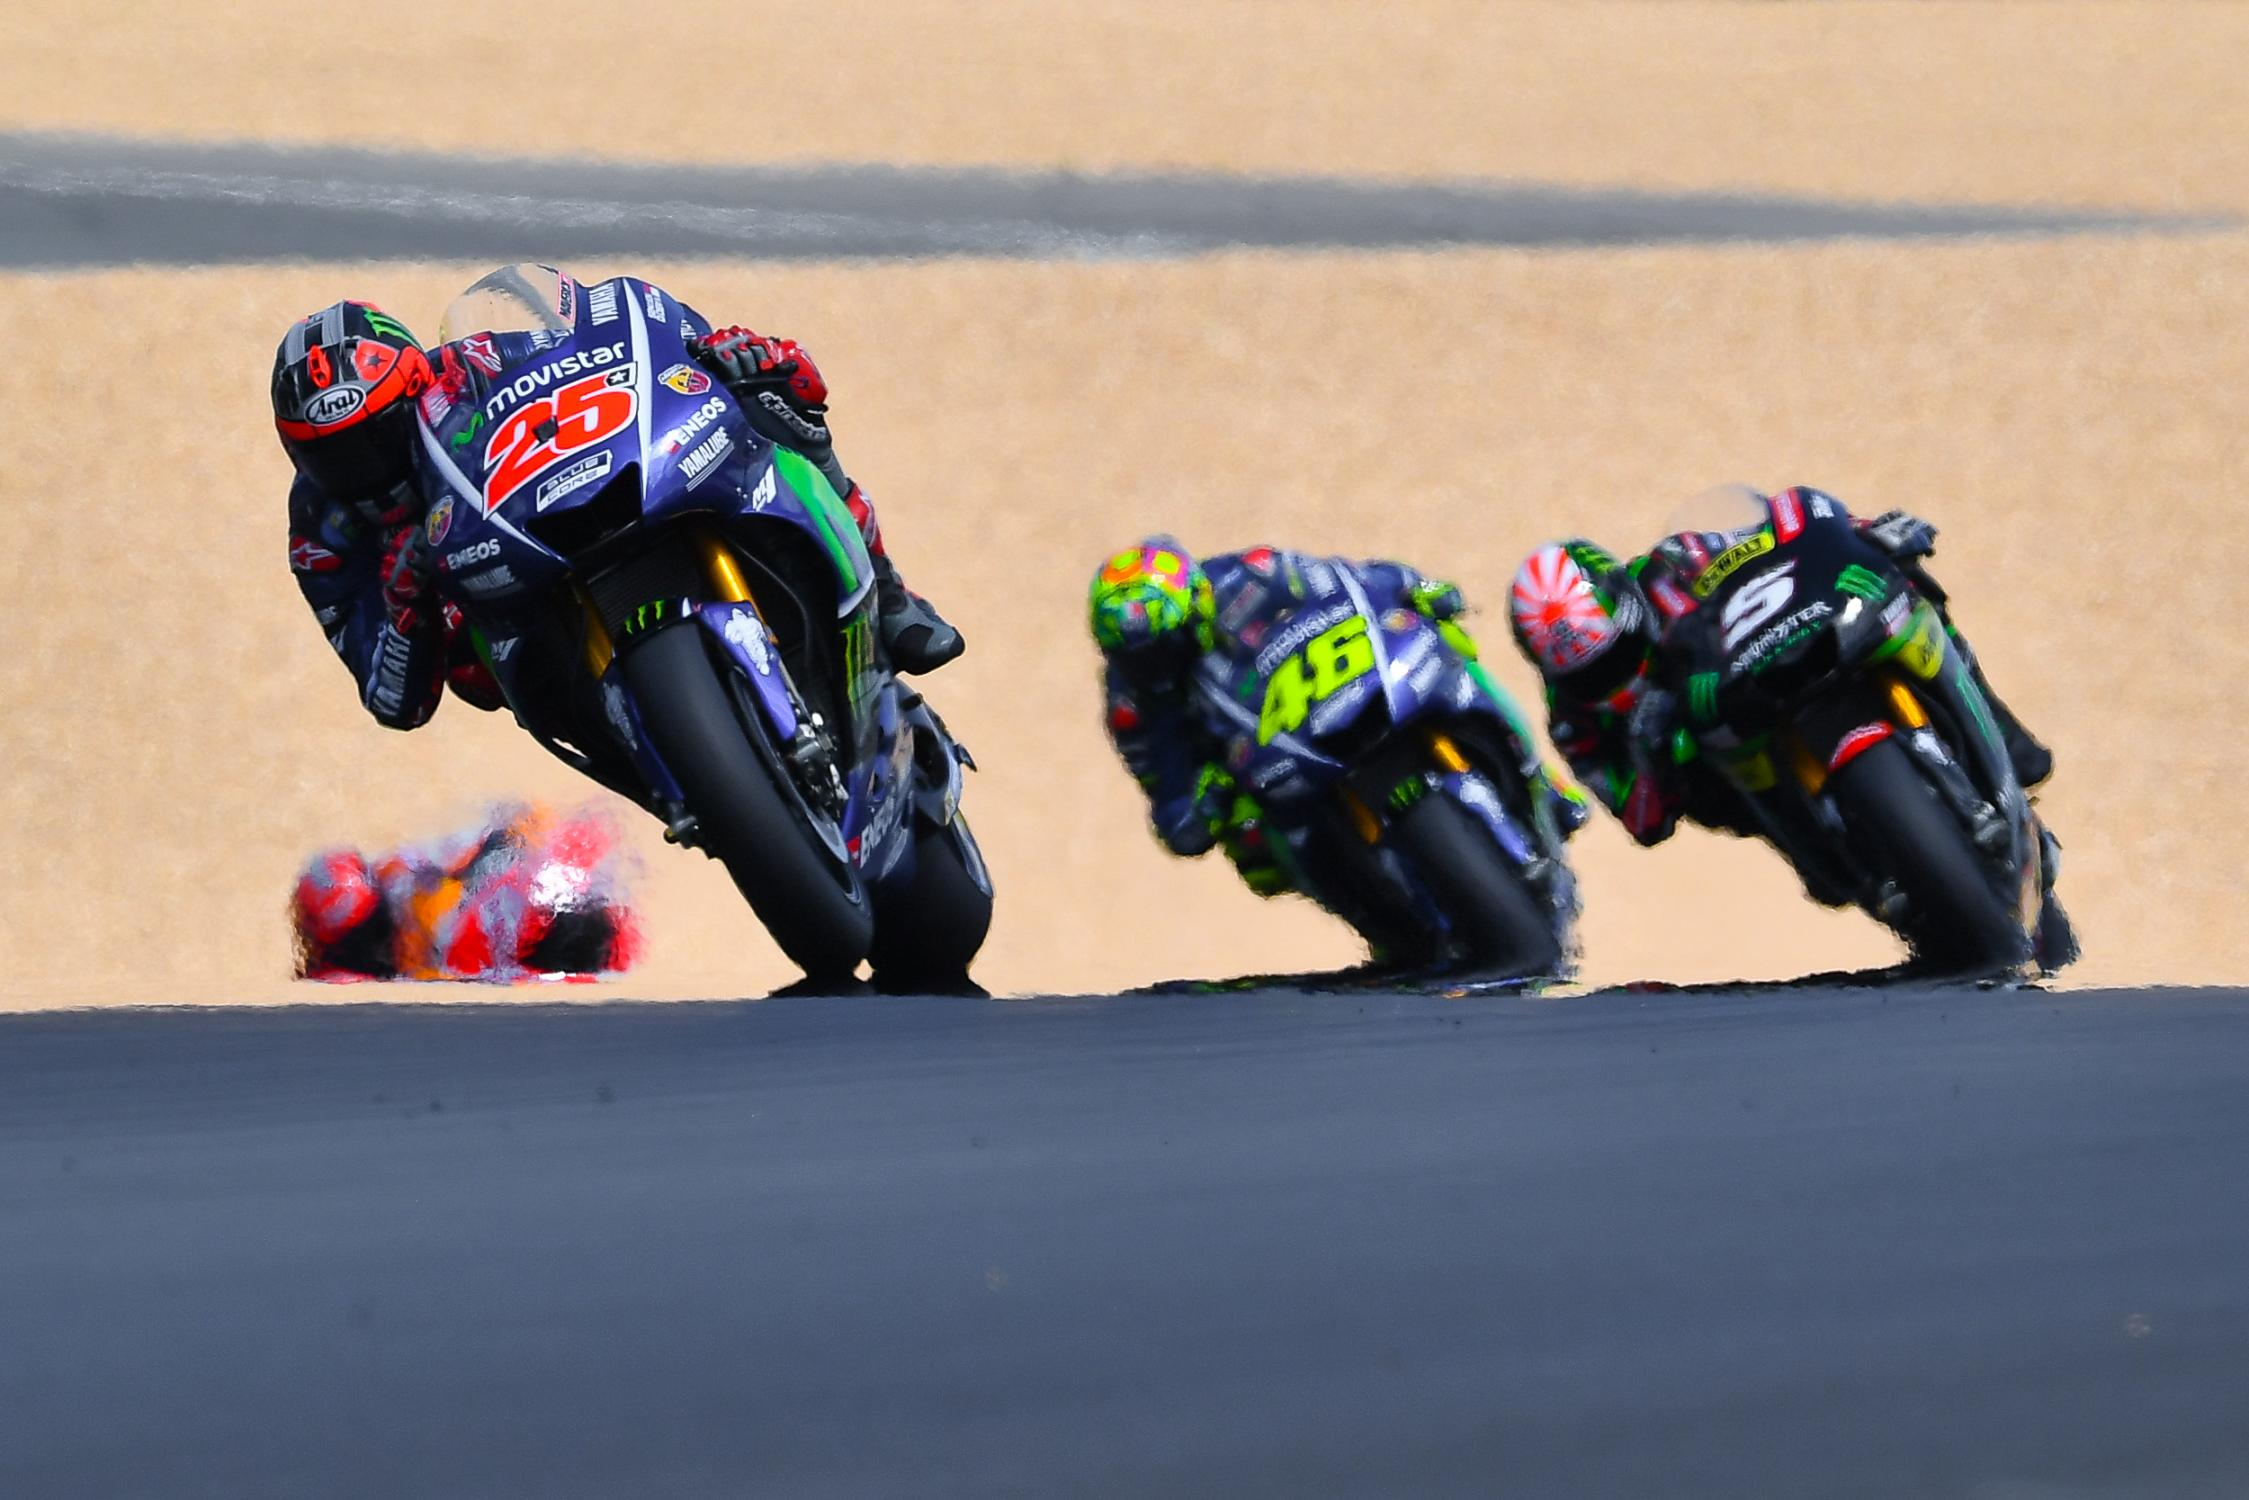 [GP] Le Mans 25-maverick-vinales-esplg5_1057.gallery_full_top_fullscreen